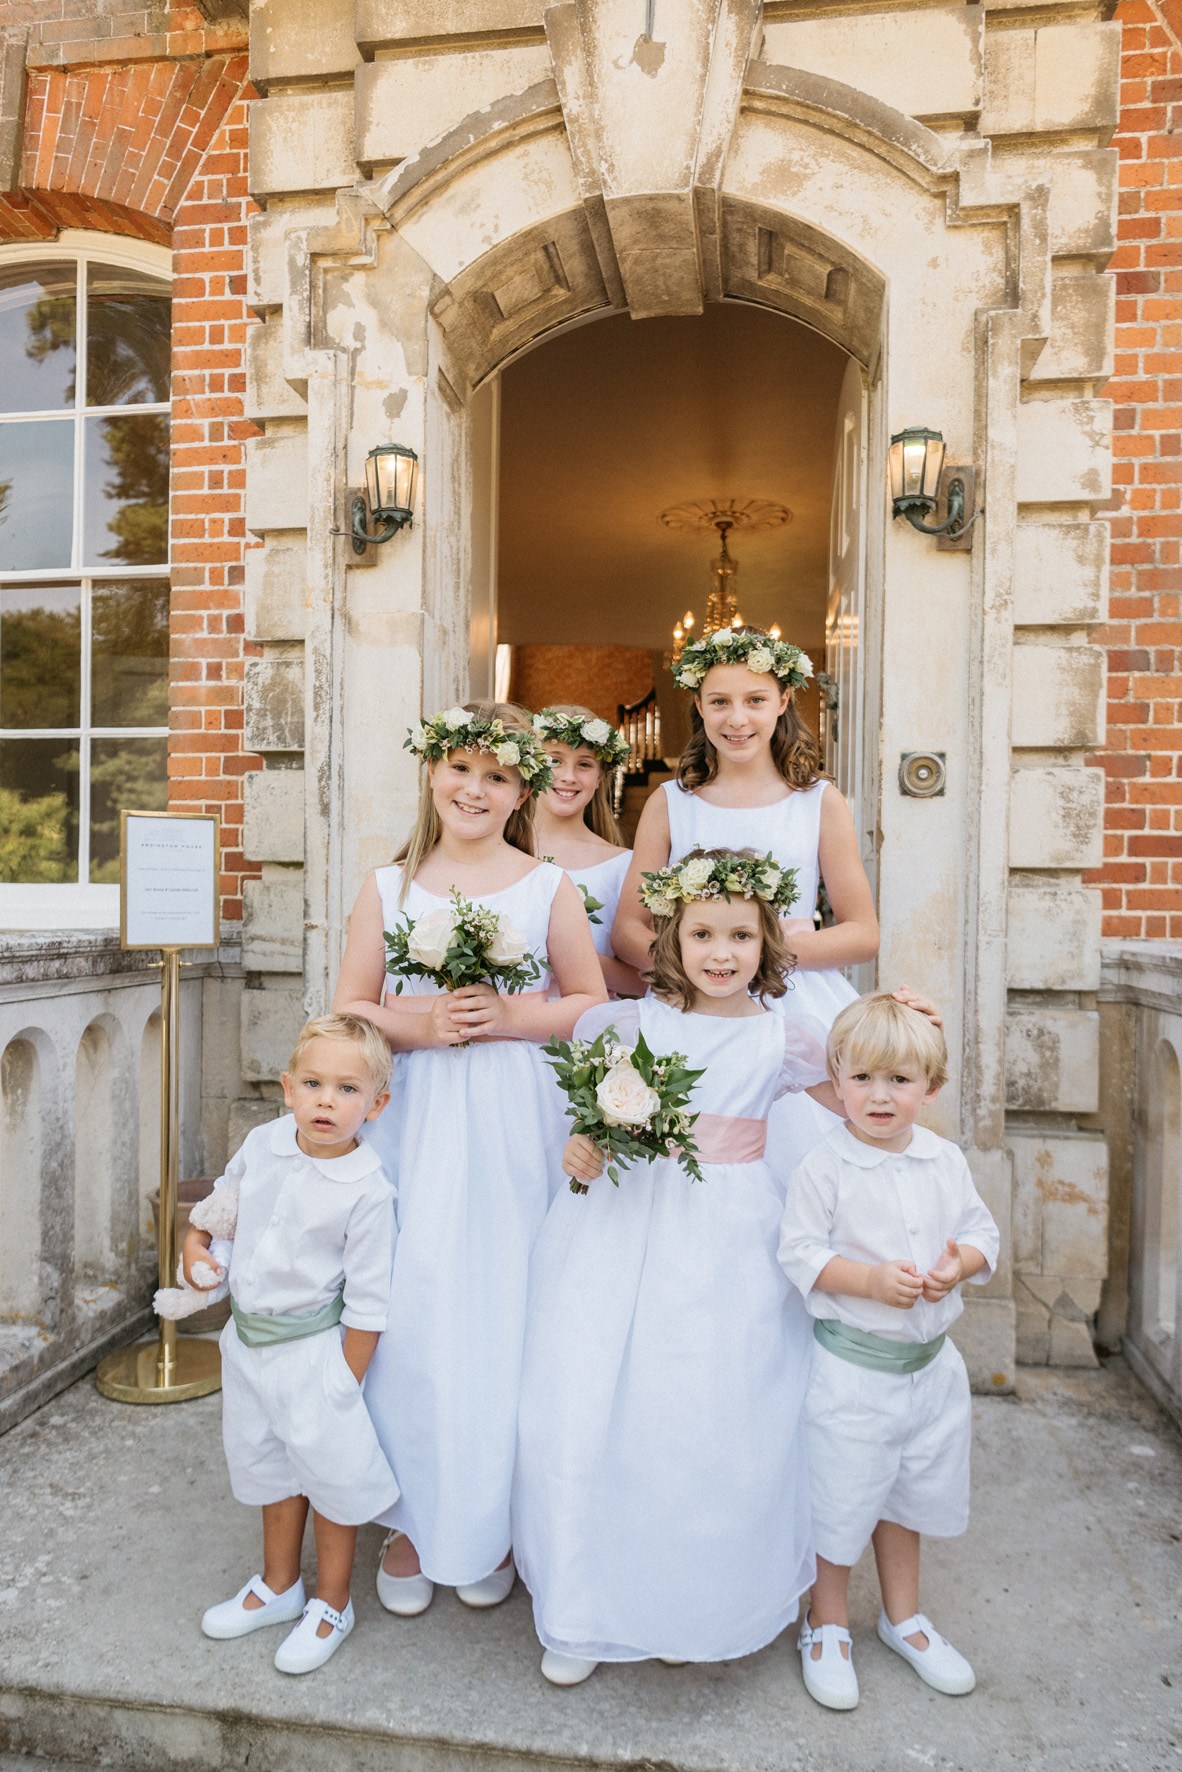 Elegant flower girls and page boys wearing Little Eglantine